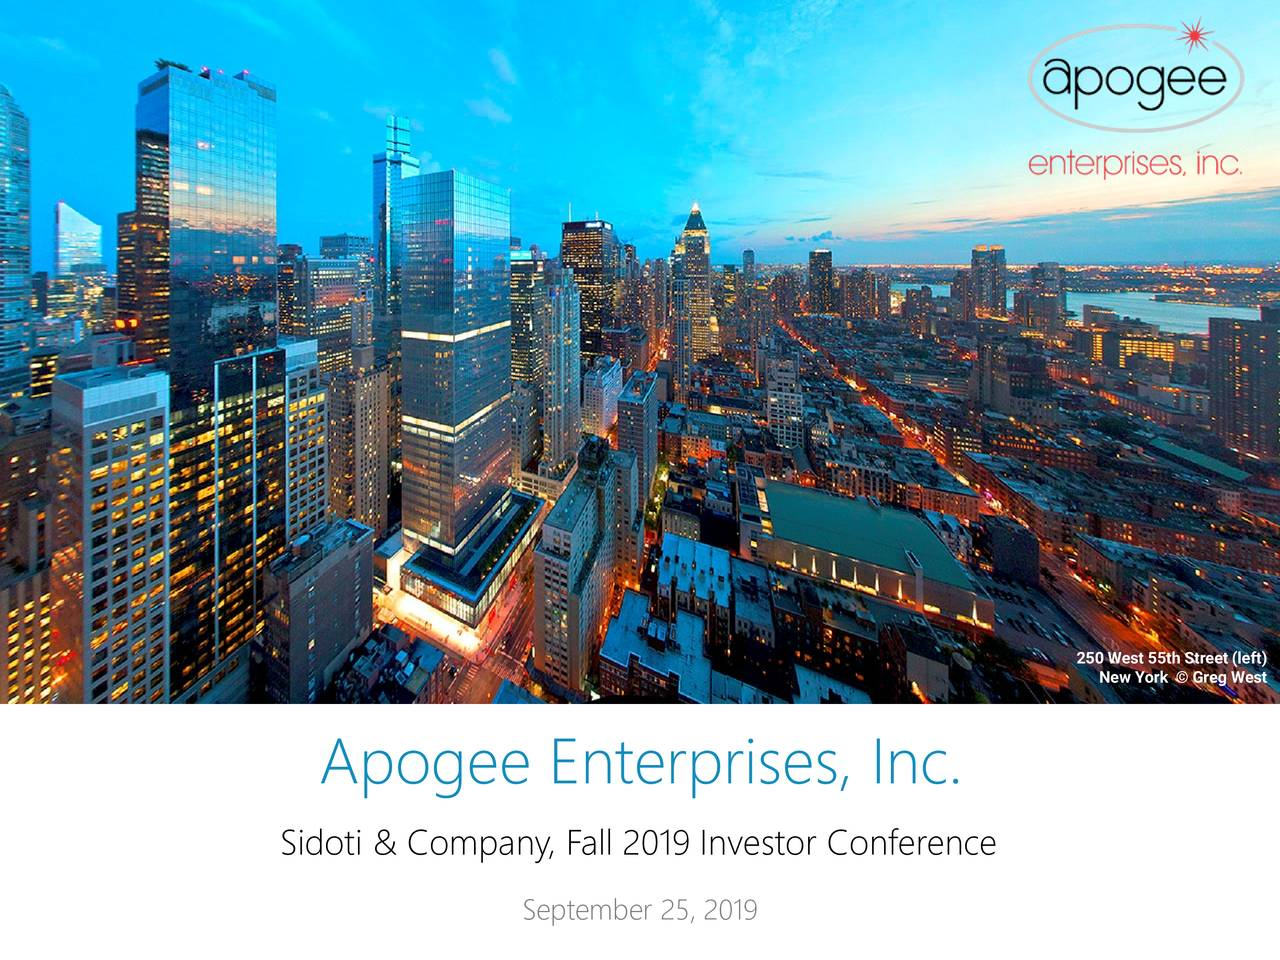 Apogee Enterprises (APOG) Presents At Sidoti & Company, Fall 2019 Investor Conference - Slideshow